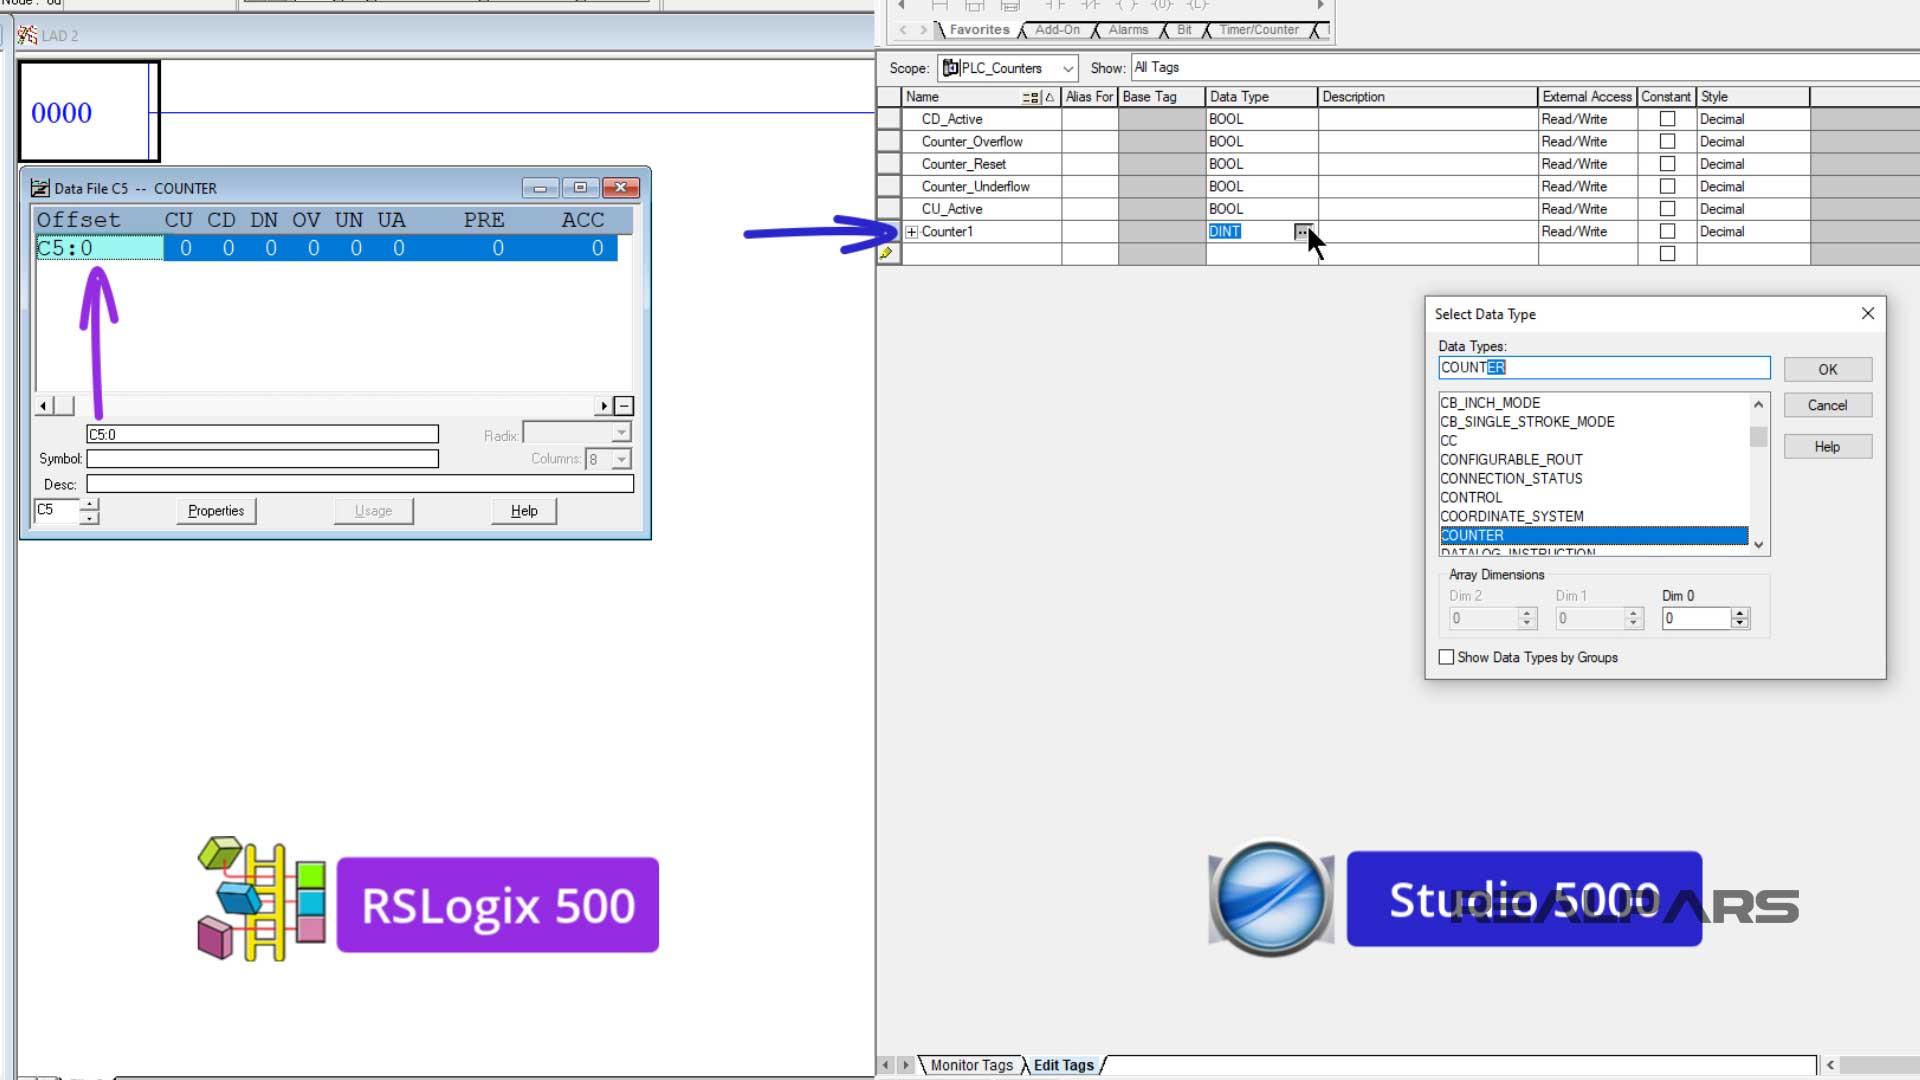 PLC counter file name